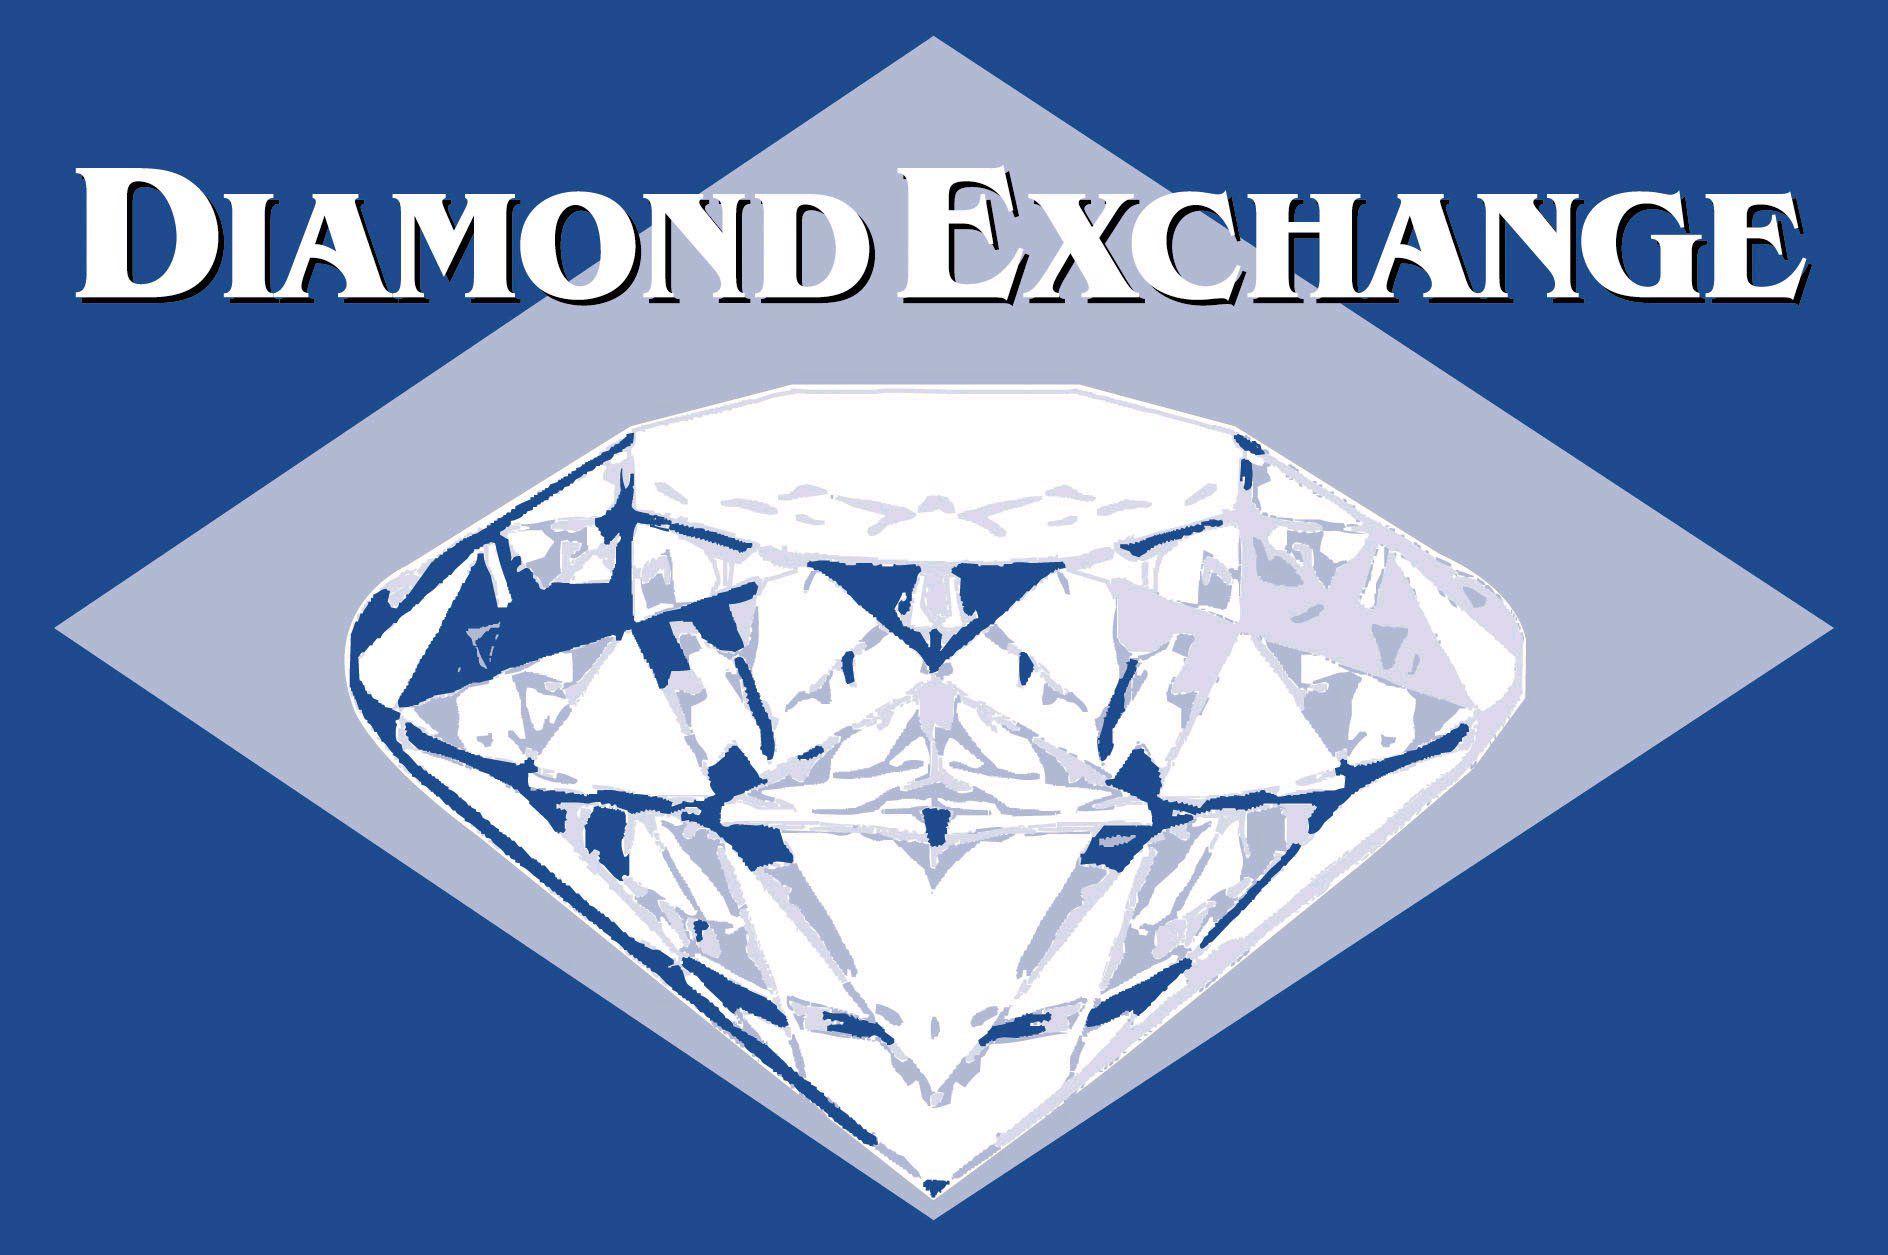 Diamond Exchange In Metairie La 504 456 3131